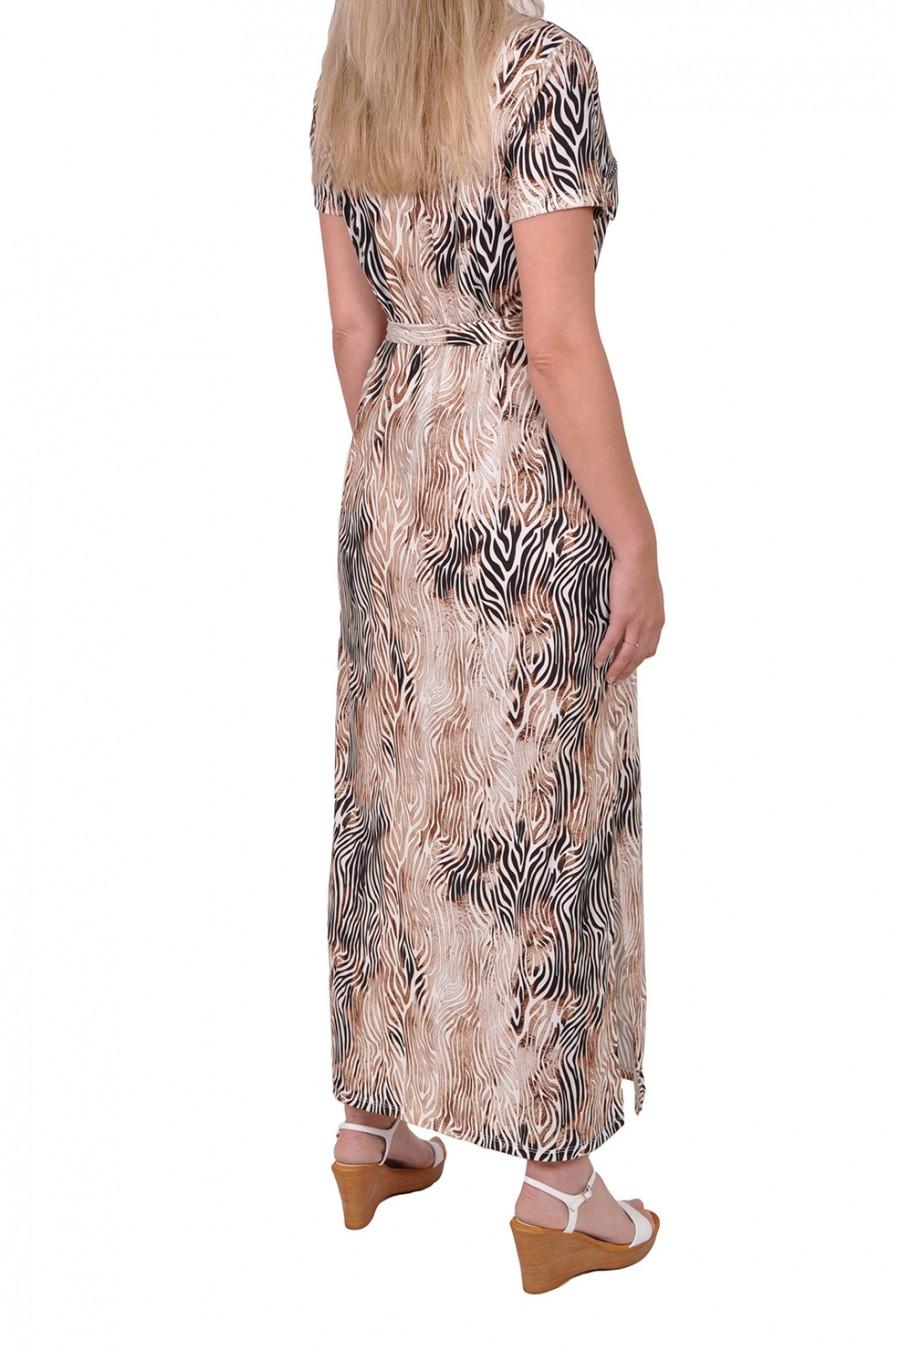 Lange jurk met v-hals en zebraprint van Savinni Savinni